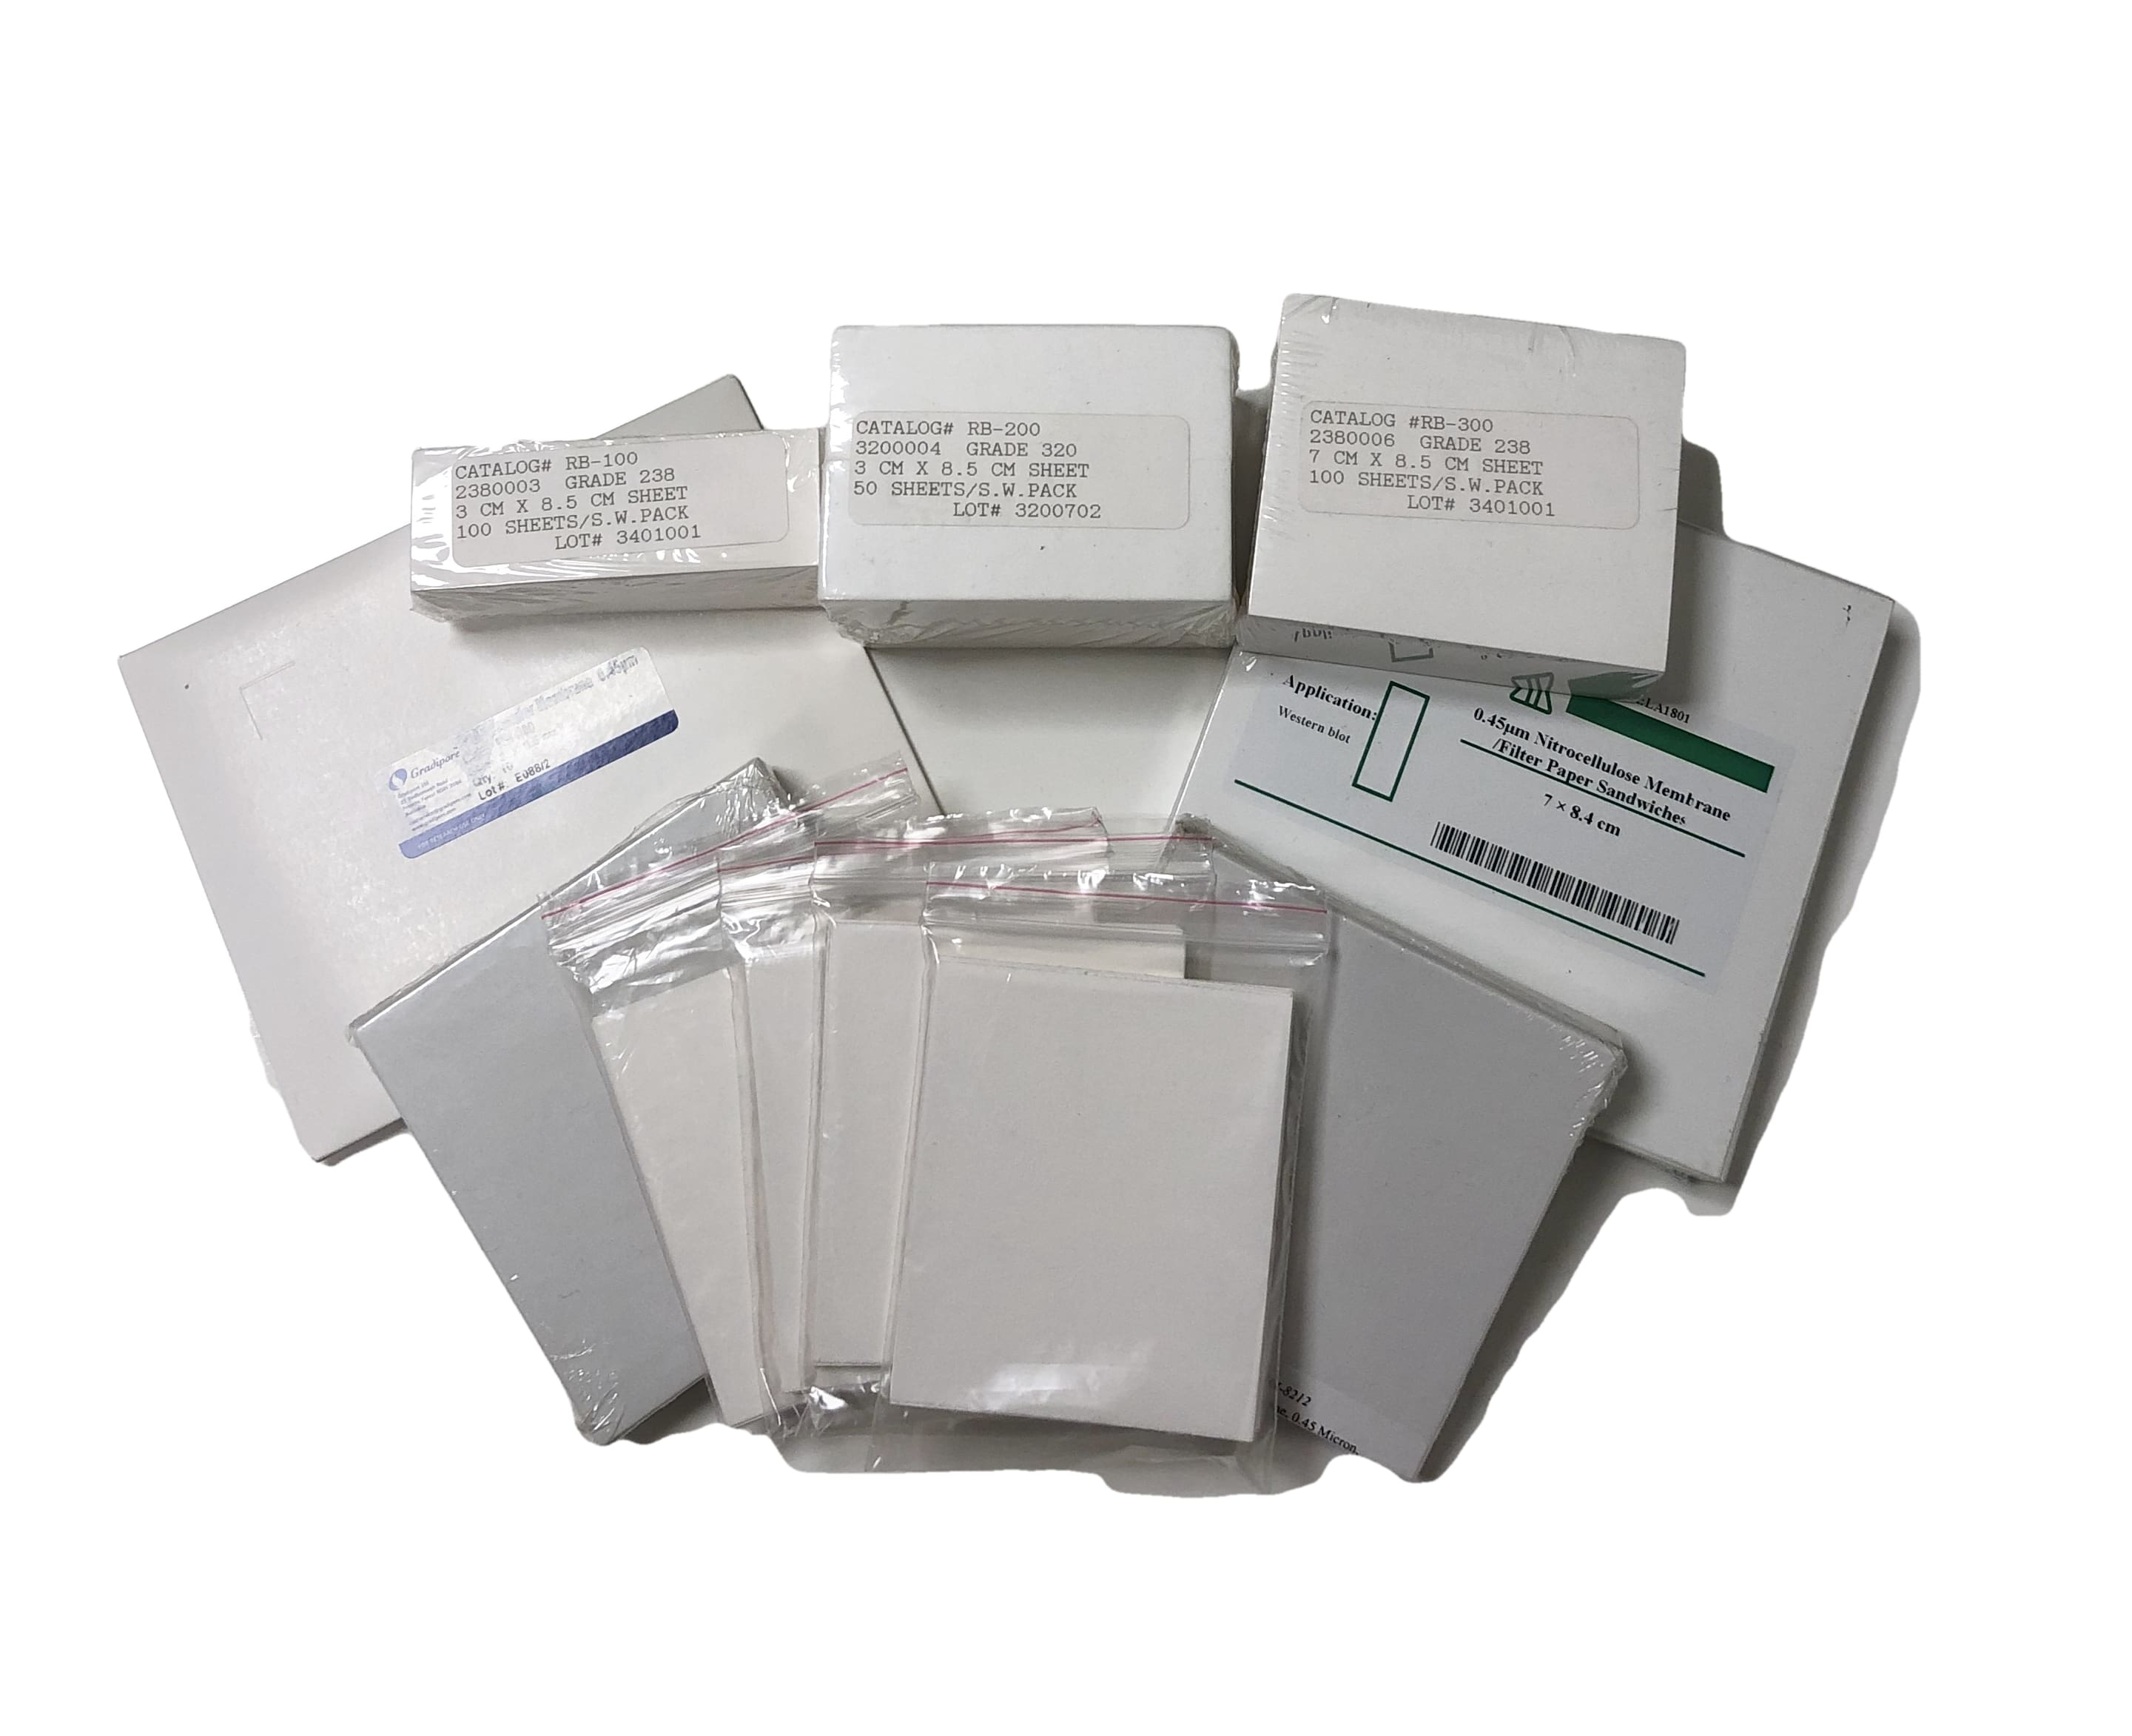 Western Blot Supplies - blotting paper, nitrocellulose membranes, and PVDF membranes